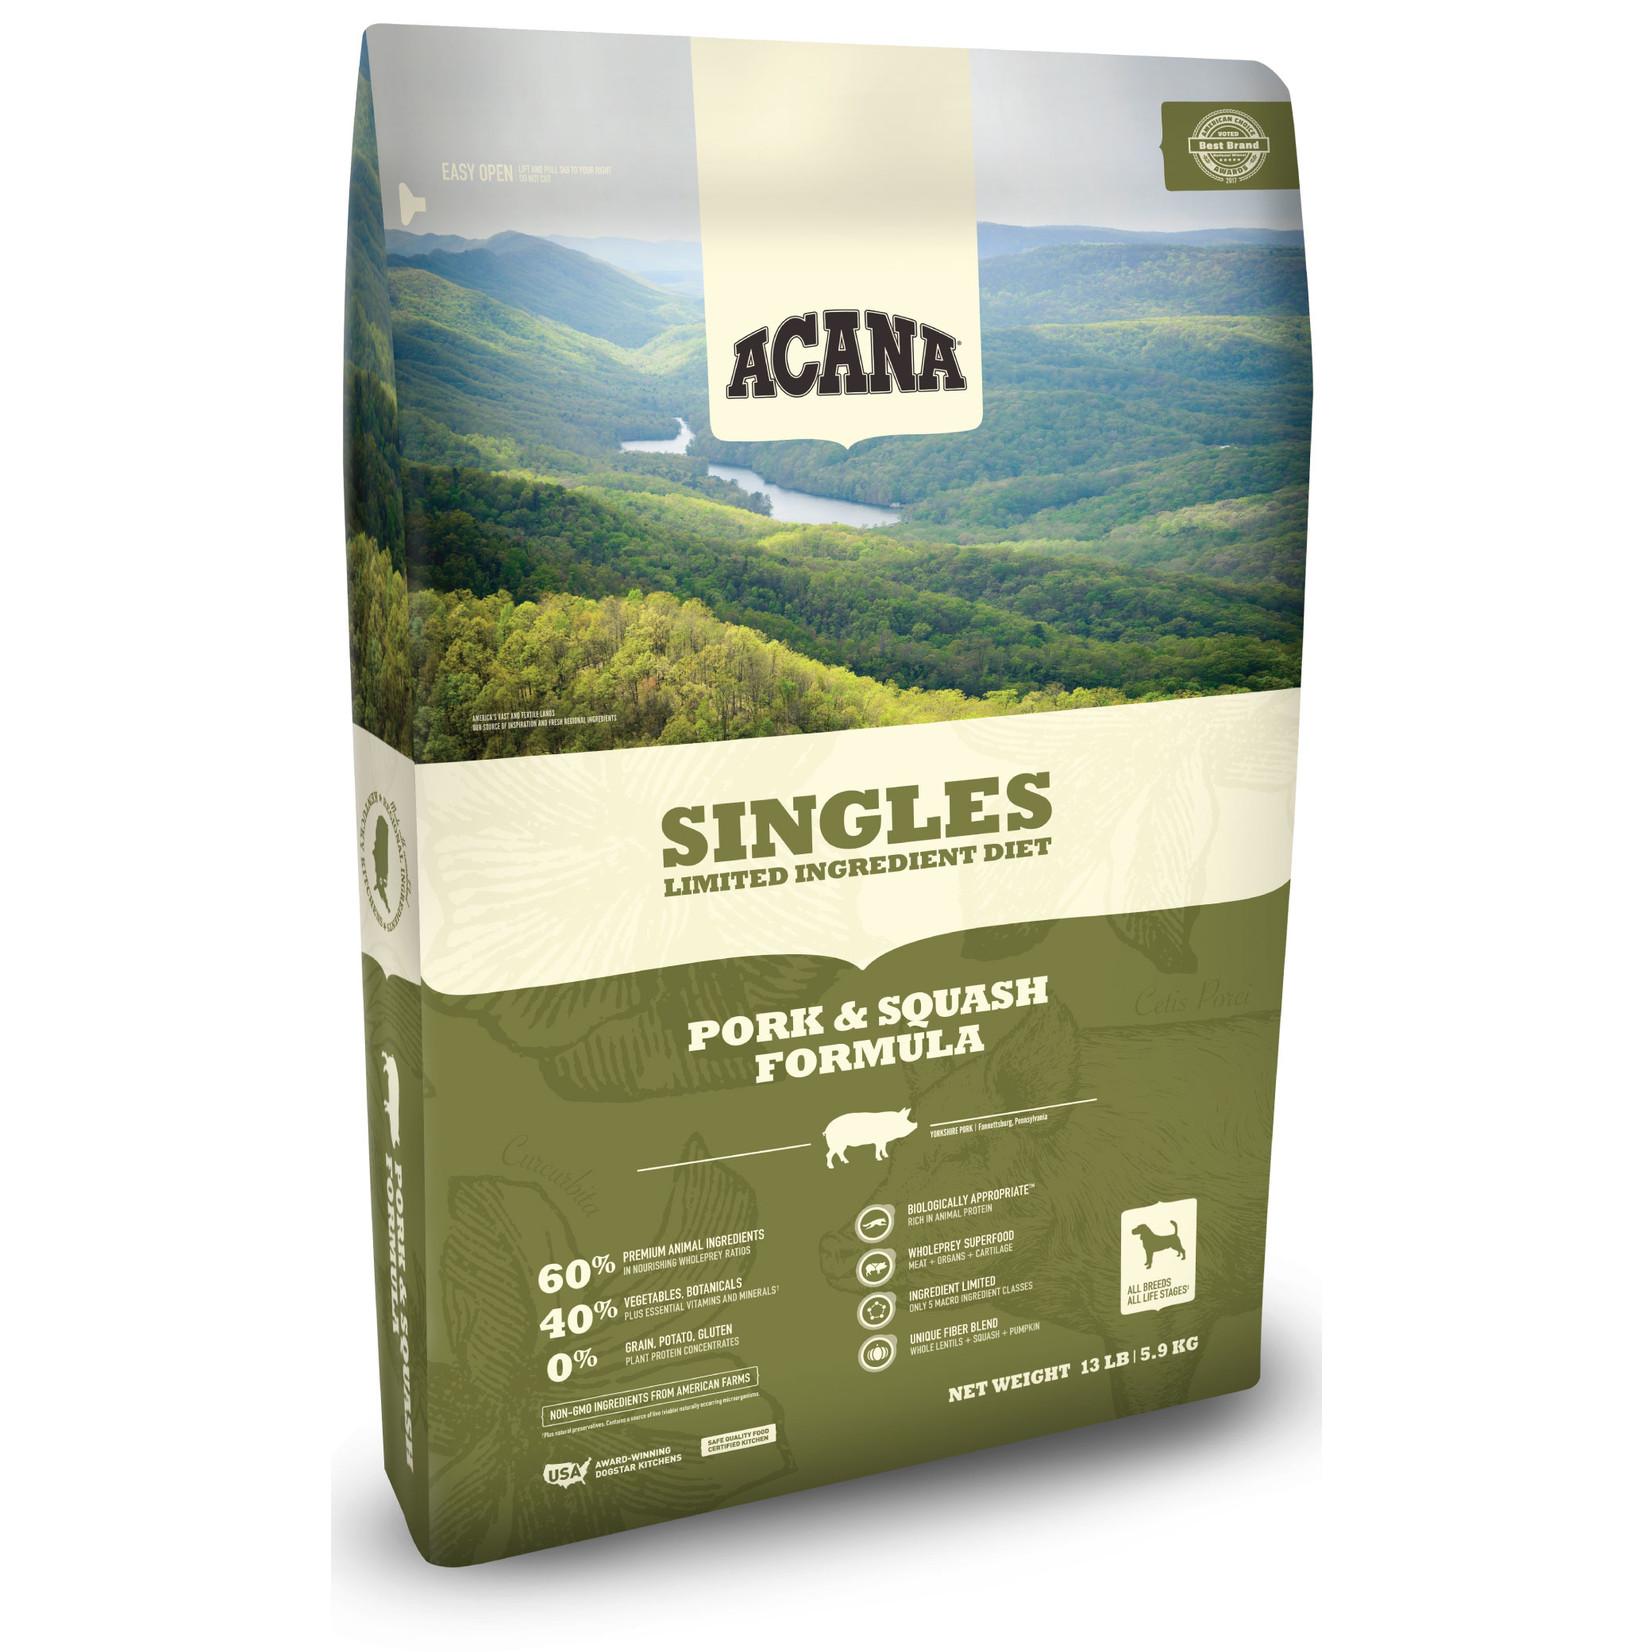 Acana Acana Singles Pork & Squash Dog Food